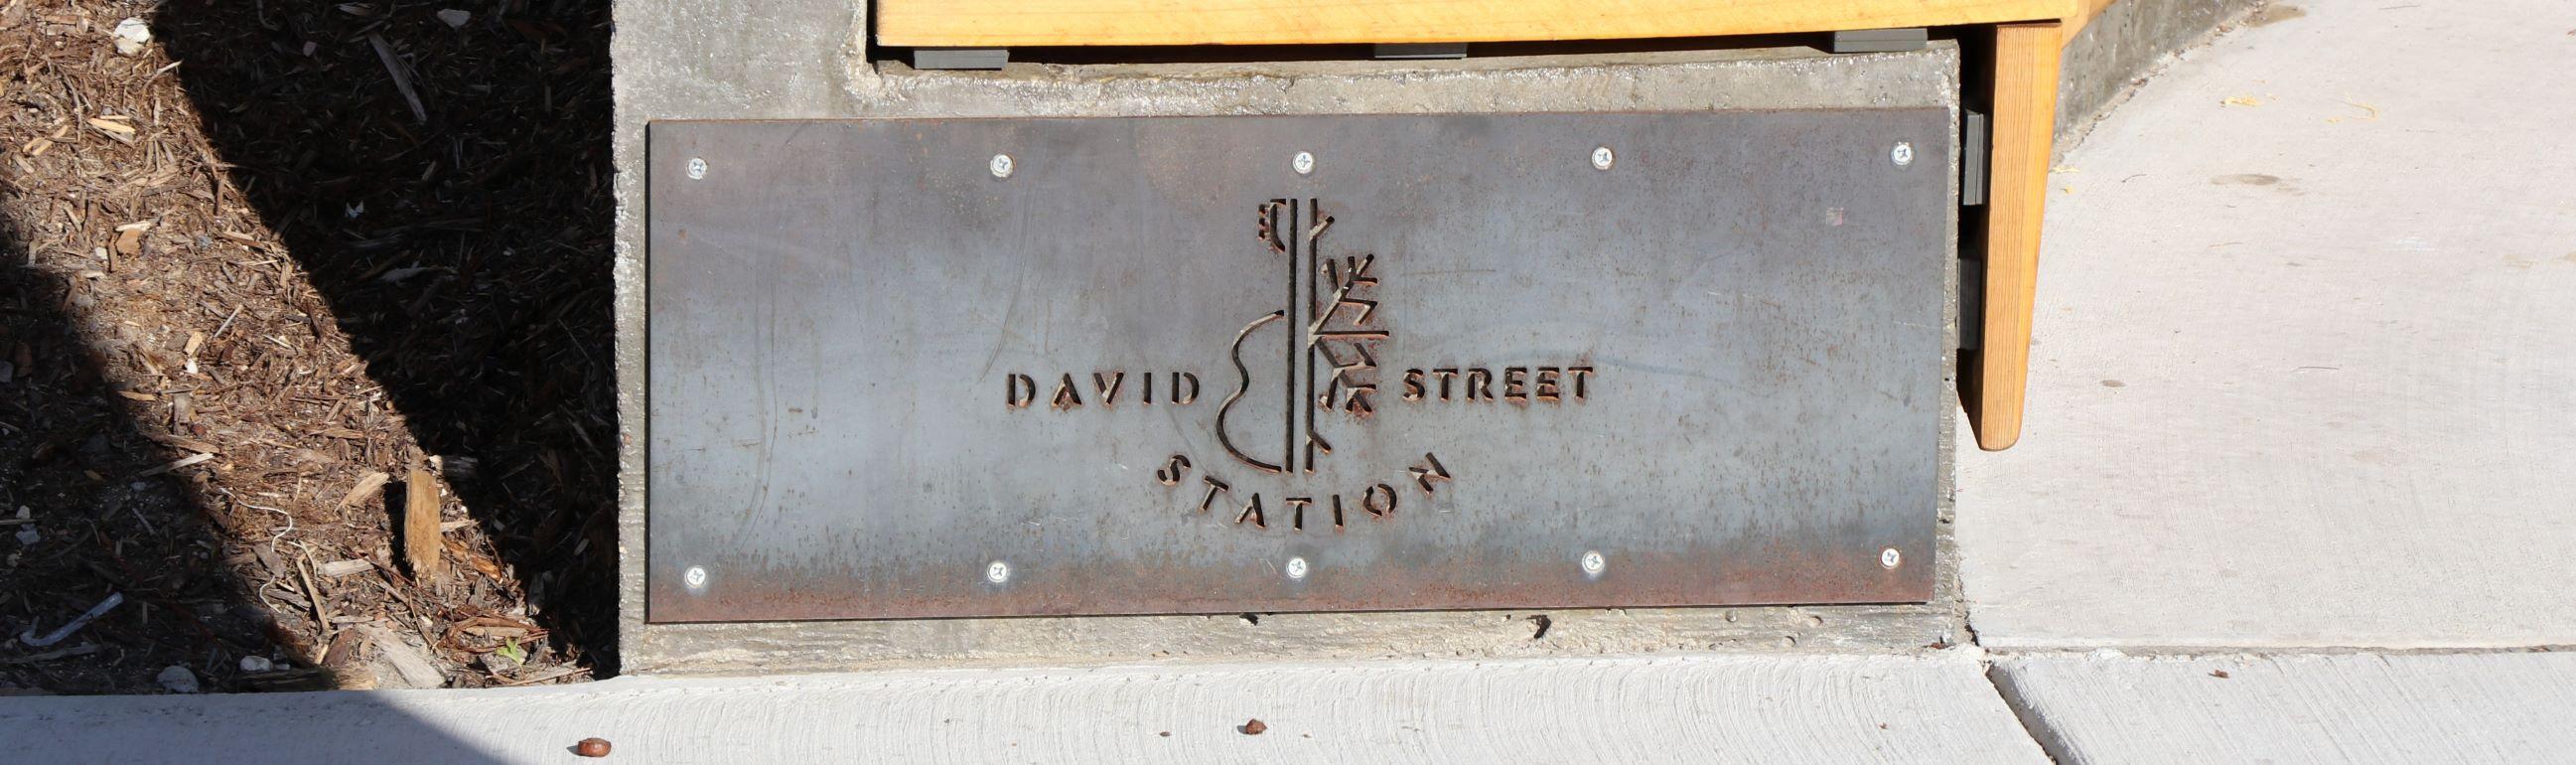 David Street Station Plaque